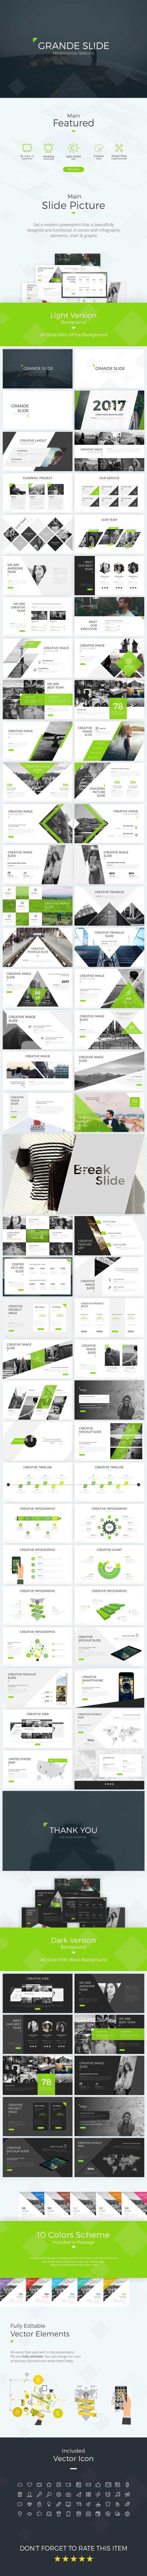 Grande - PowerPoint Presentation Template - 65+ Multipurpose Slides, Clean, Unique, Creative and Simple